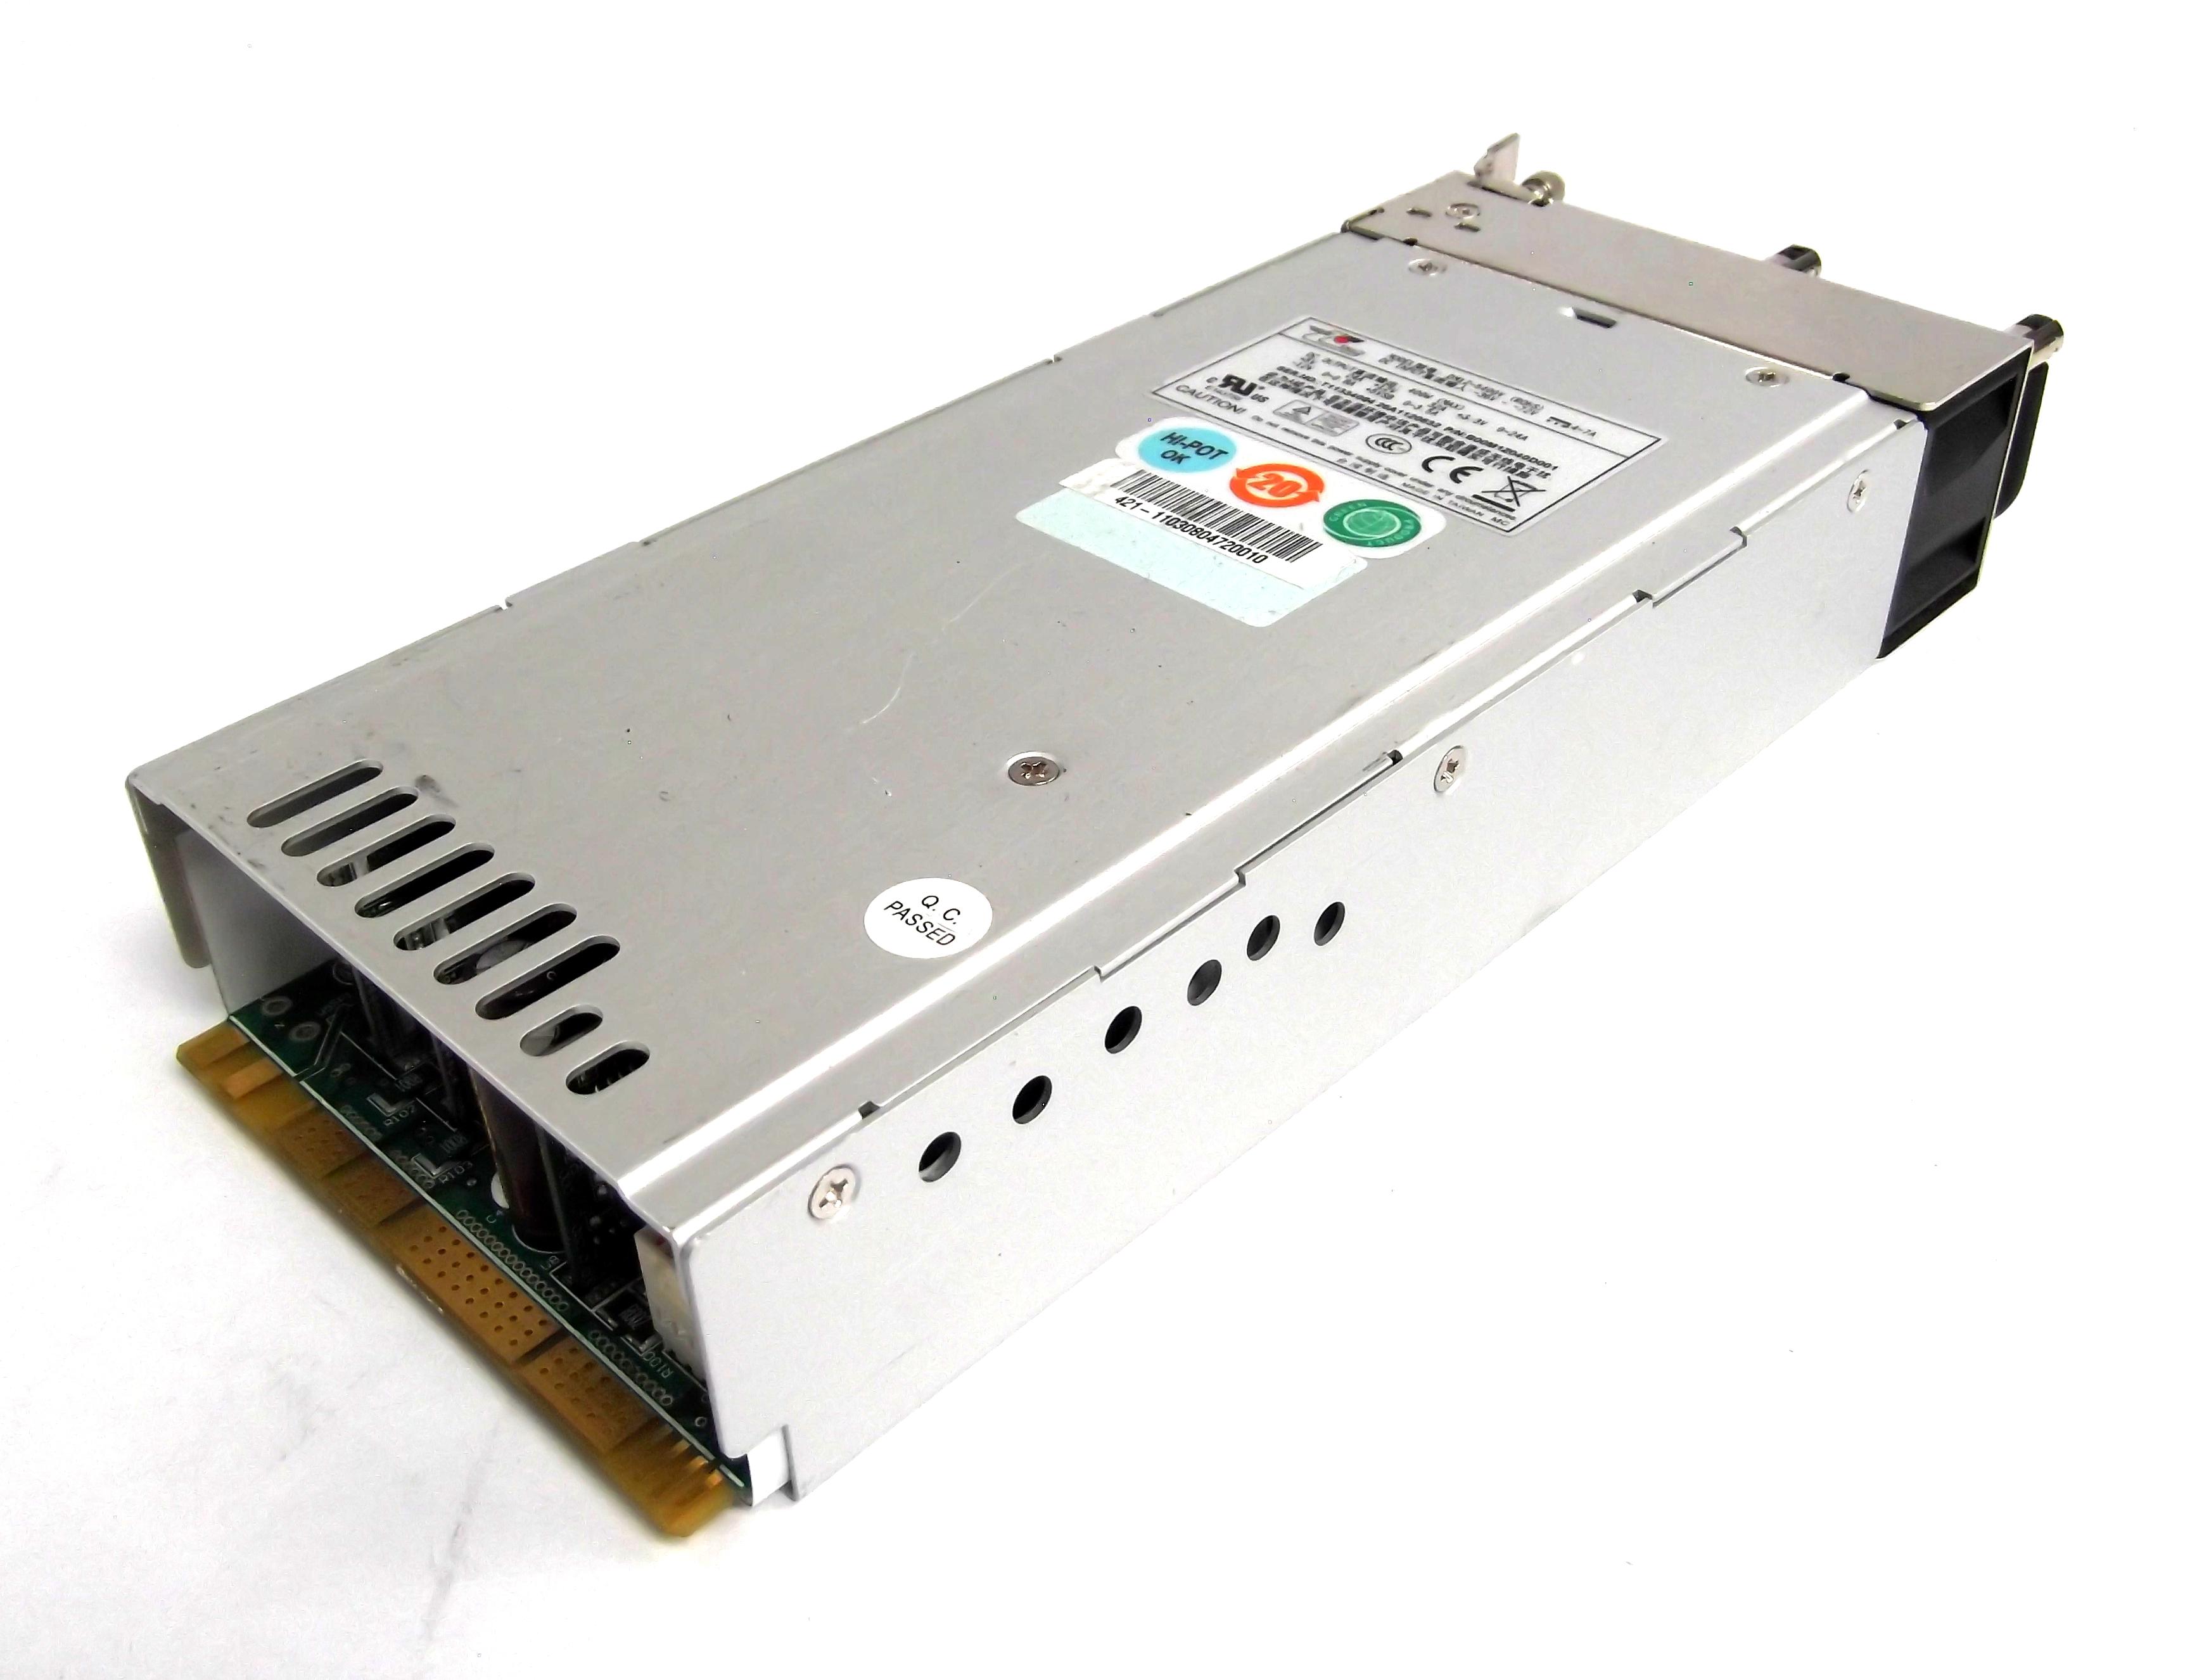 Emacs DM1Z-5400V 400W Power Supply - B00M1Z040D001